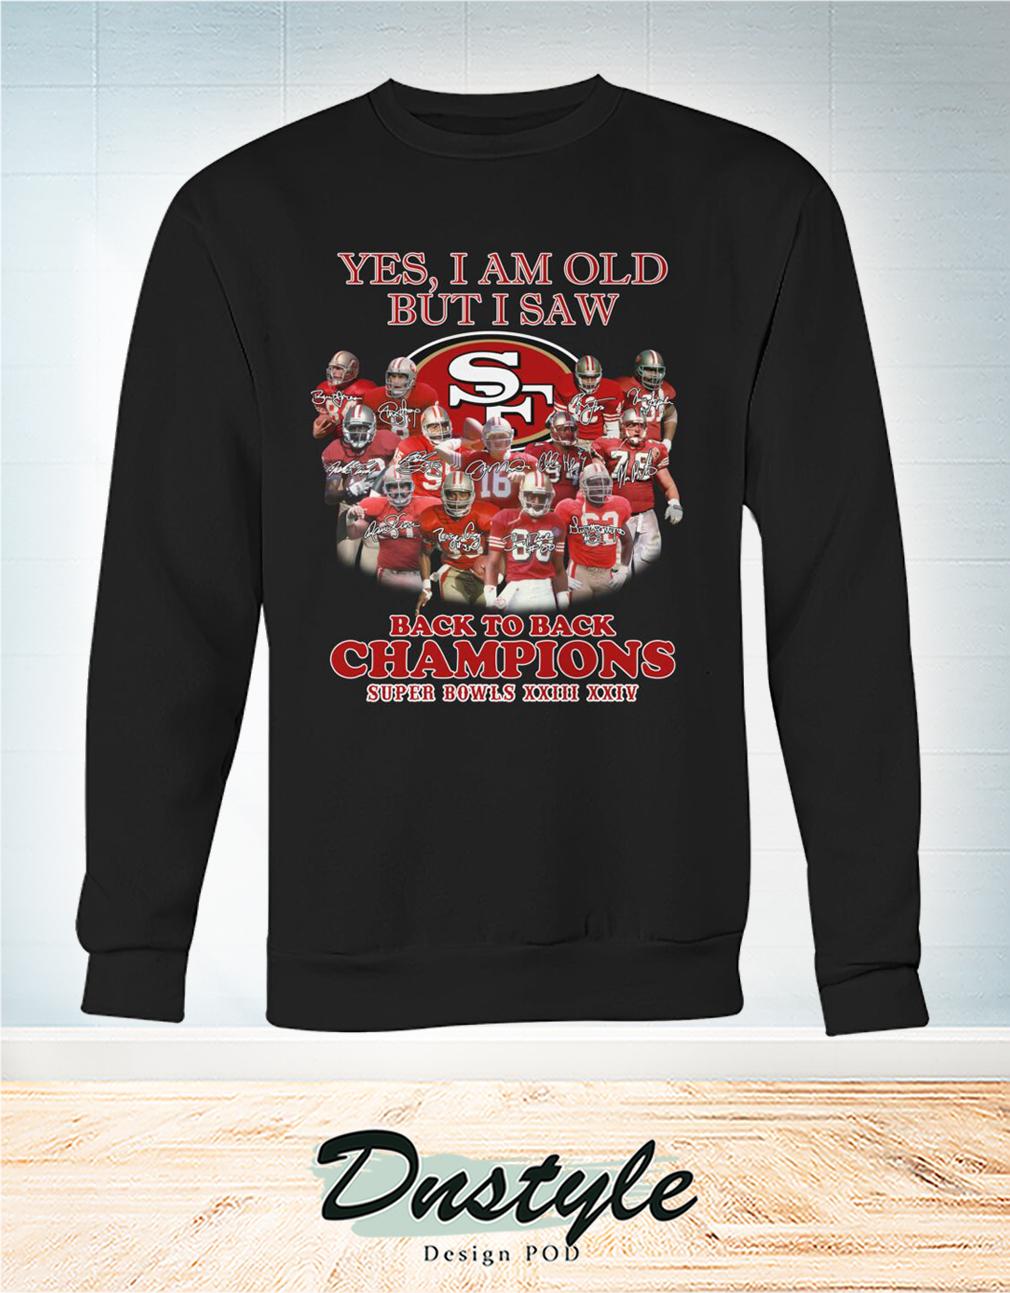 San Francisco 49ers yes I am old but I saw back to back champions sweatshirt